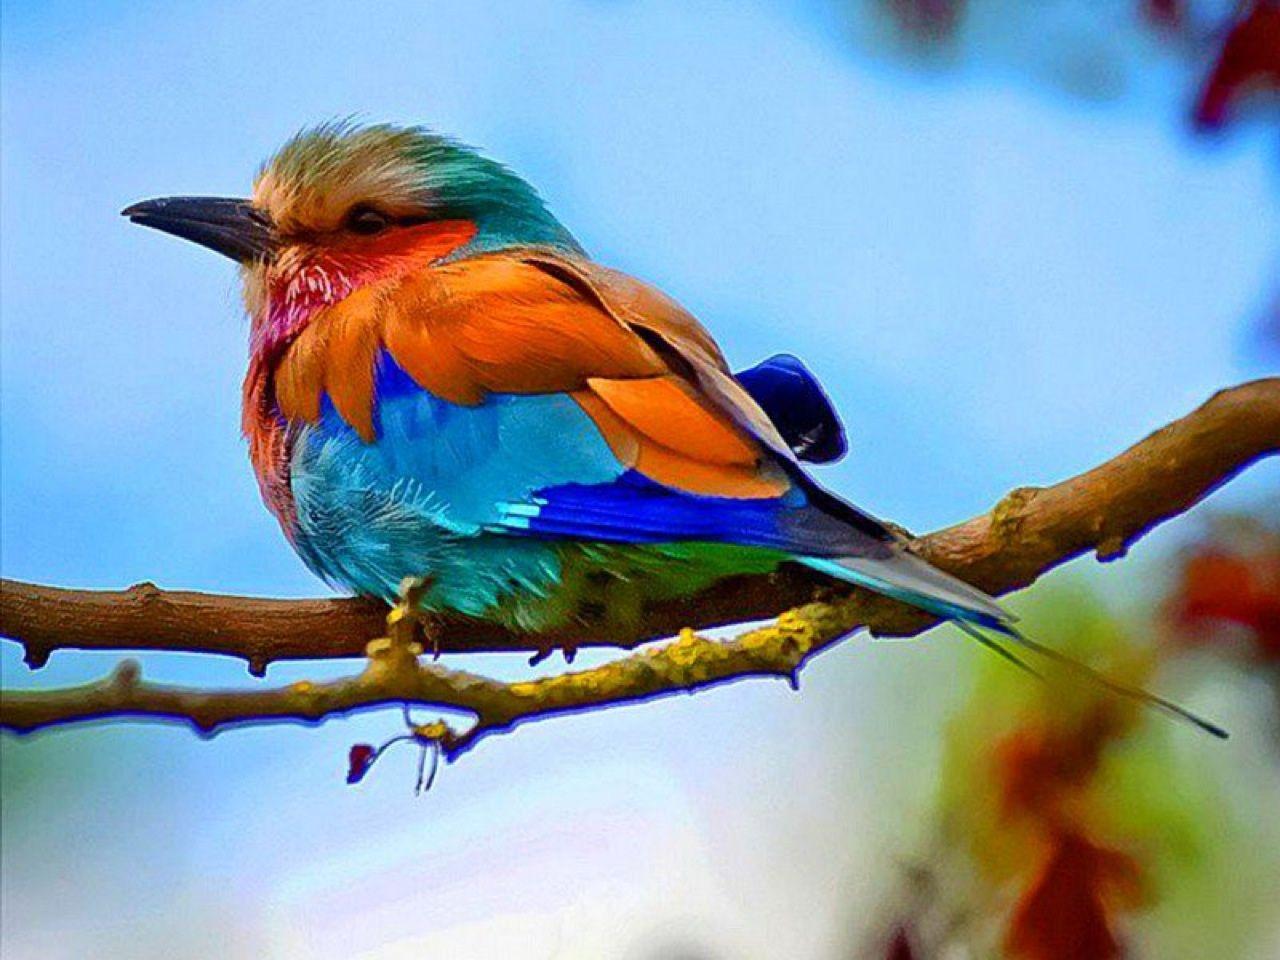 Colorful Bird Photography Colorful Birds Photo 4 Birds